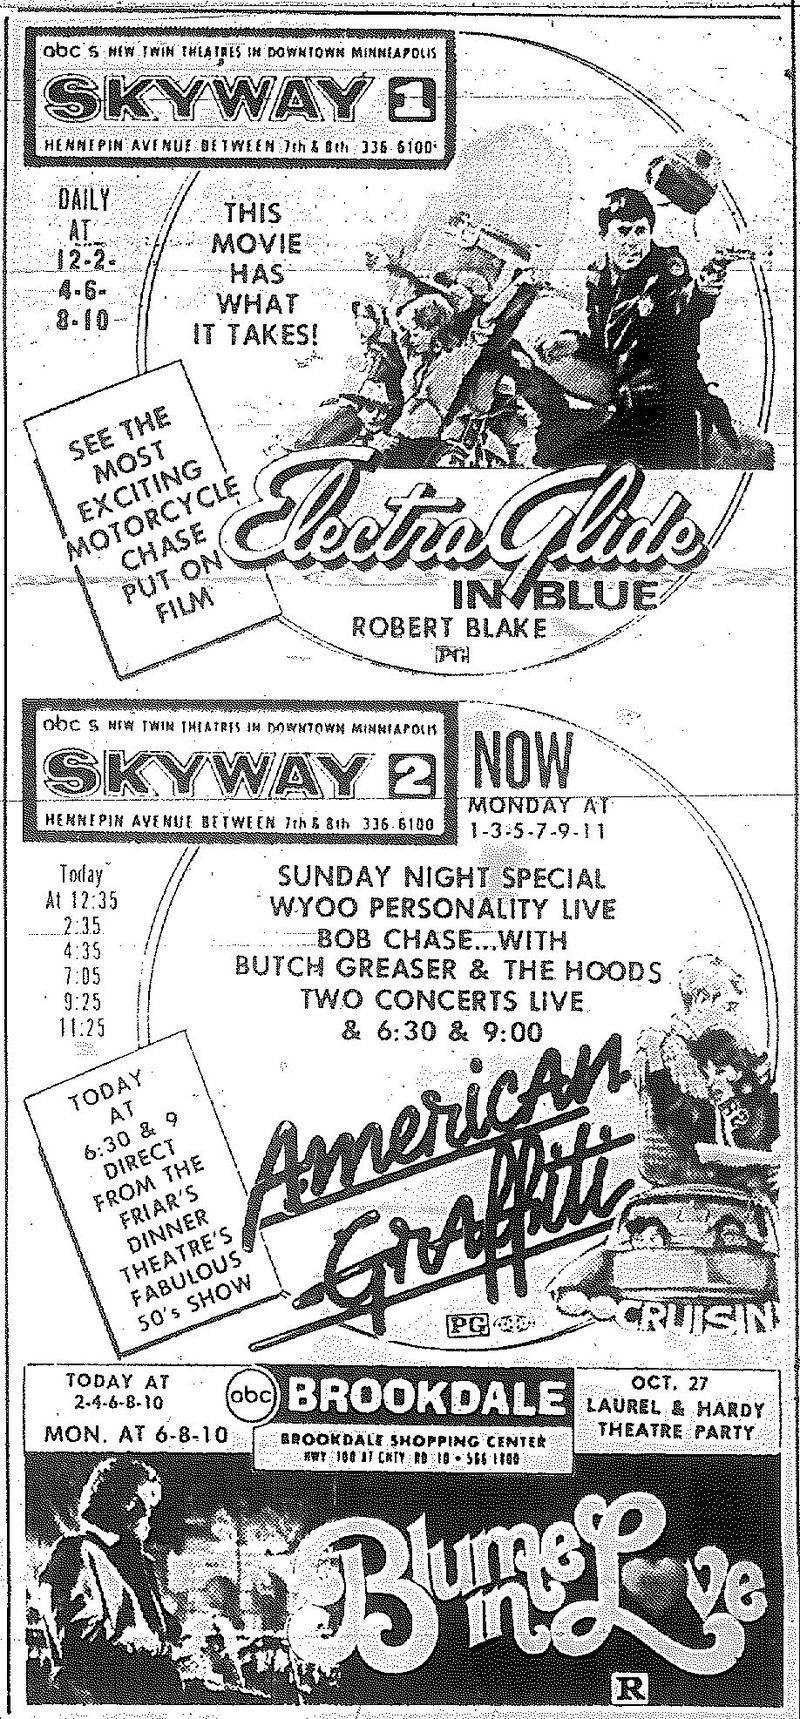 Minnesota Movie Ads 1973 4